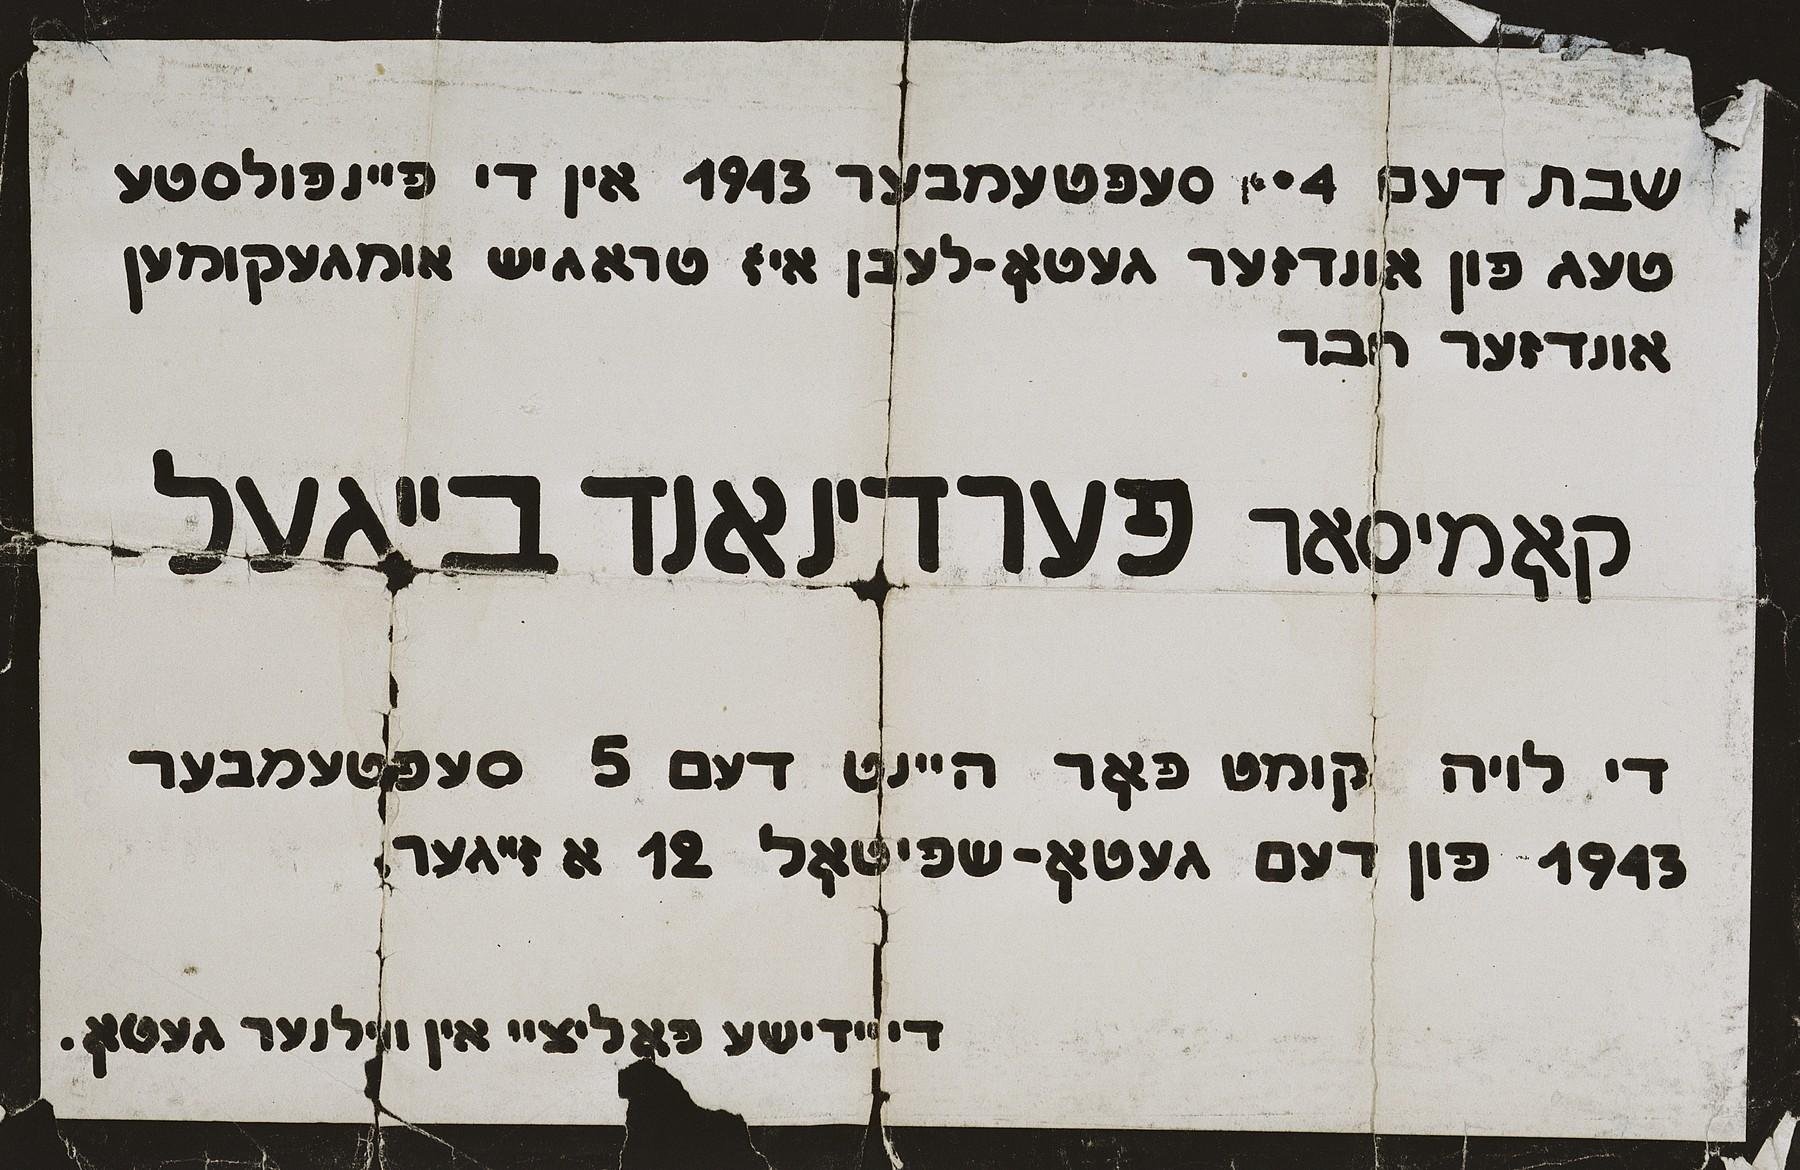 Death announcement in Yiddish for Vilna Jewish police chief Ferdinand Beigel.